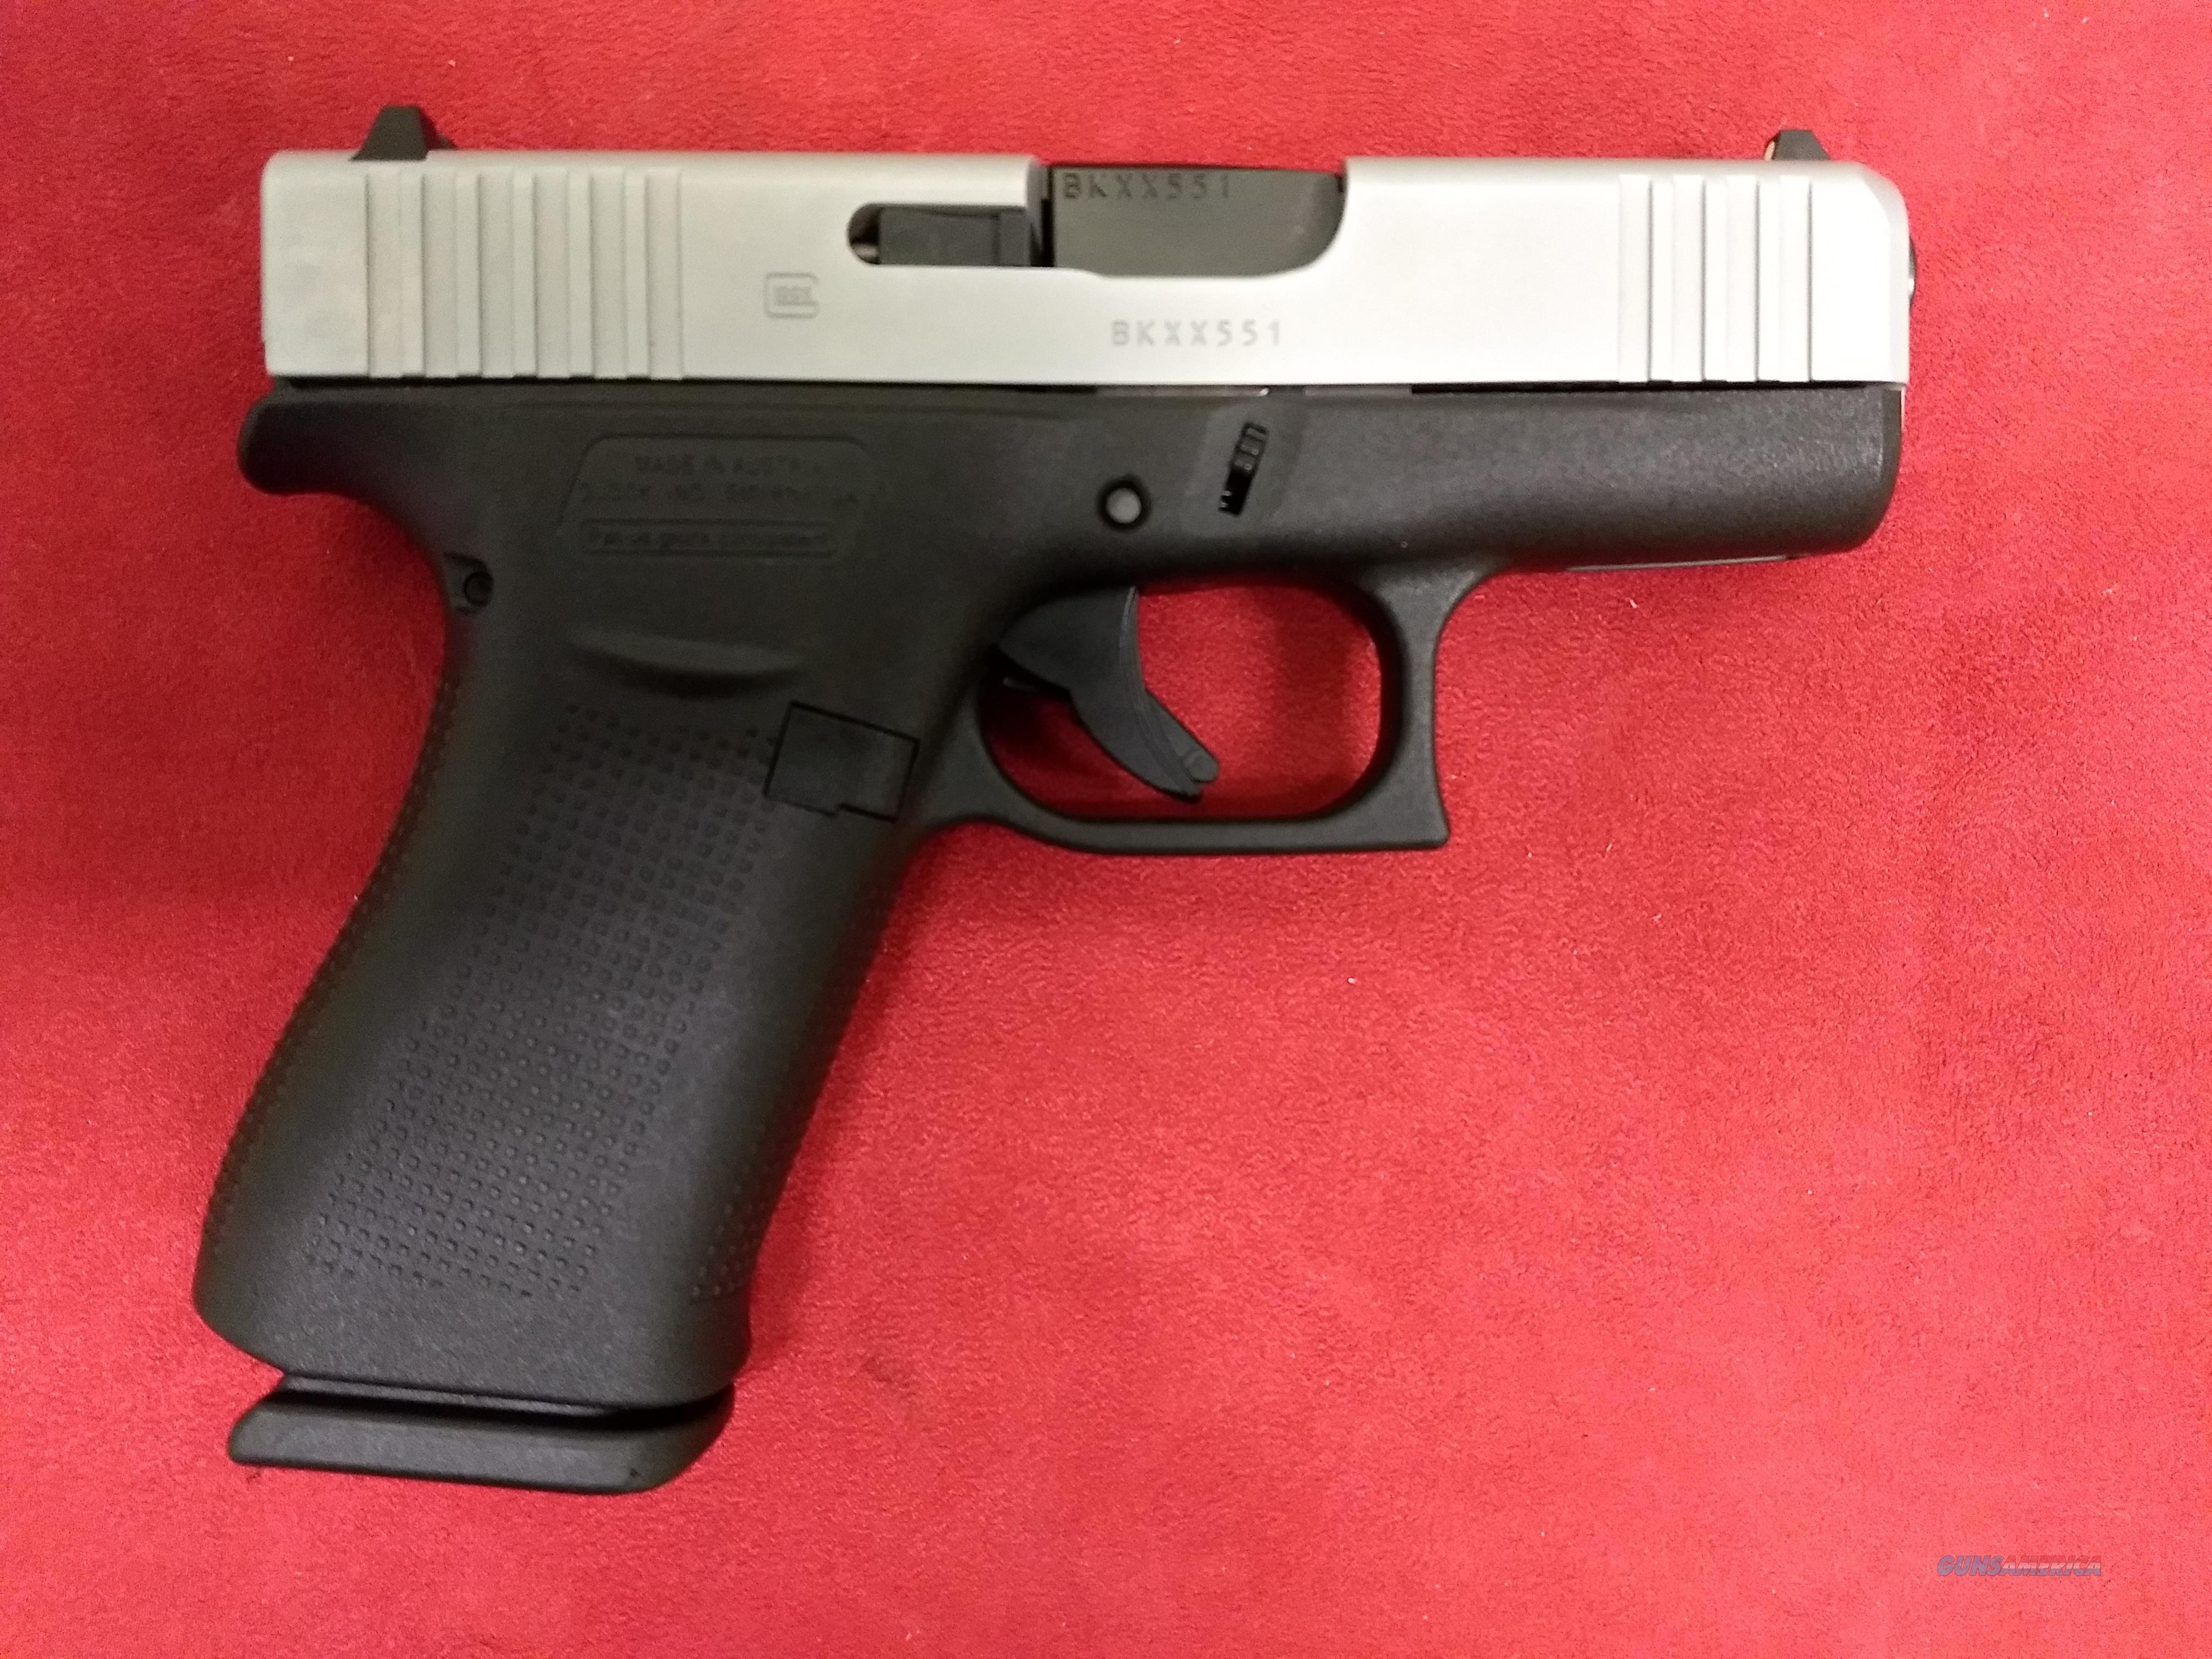 Glock Model 43X, 9mm, Two-Tone, NIB  Guns > Pistols > Glock Pistols > 43/43X